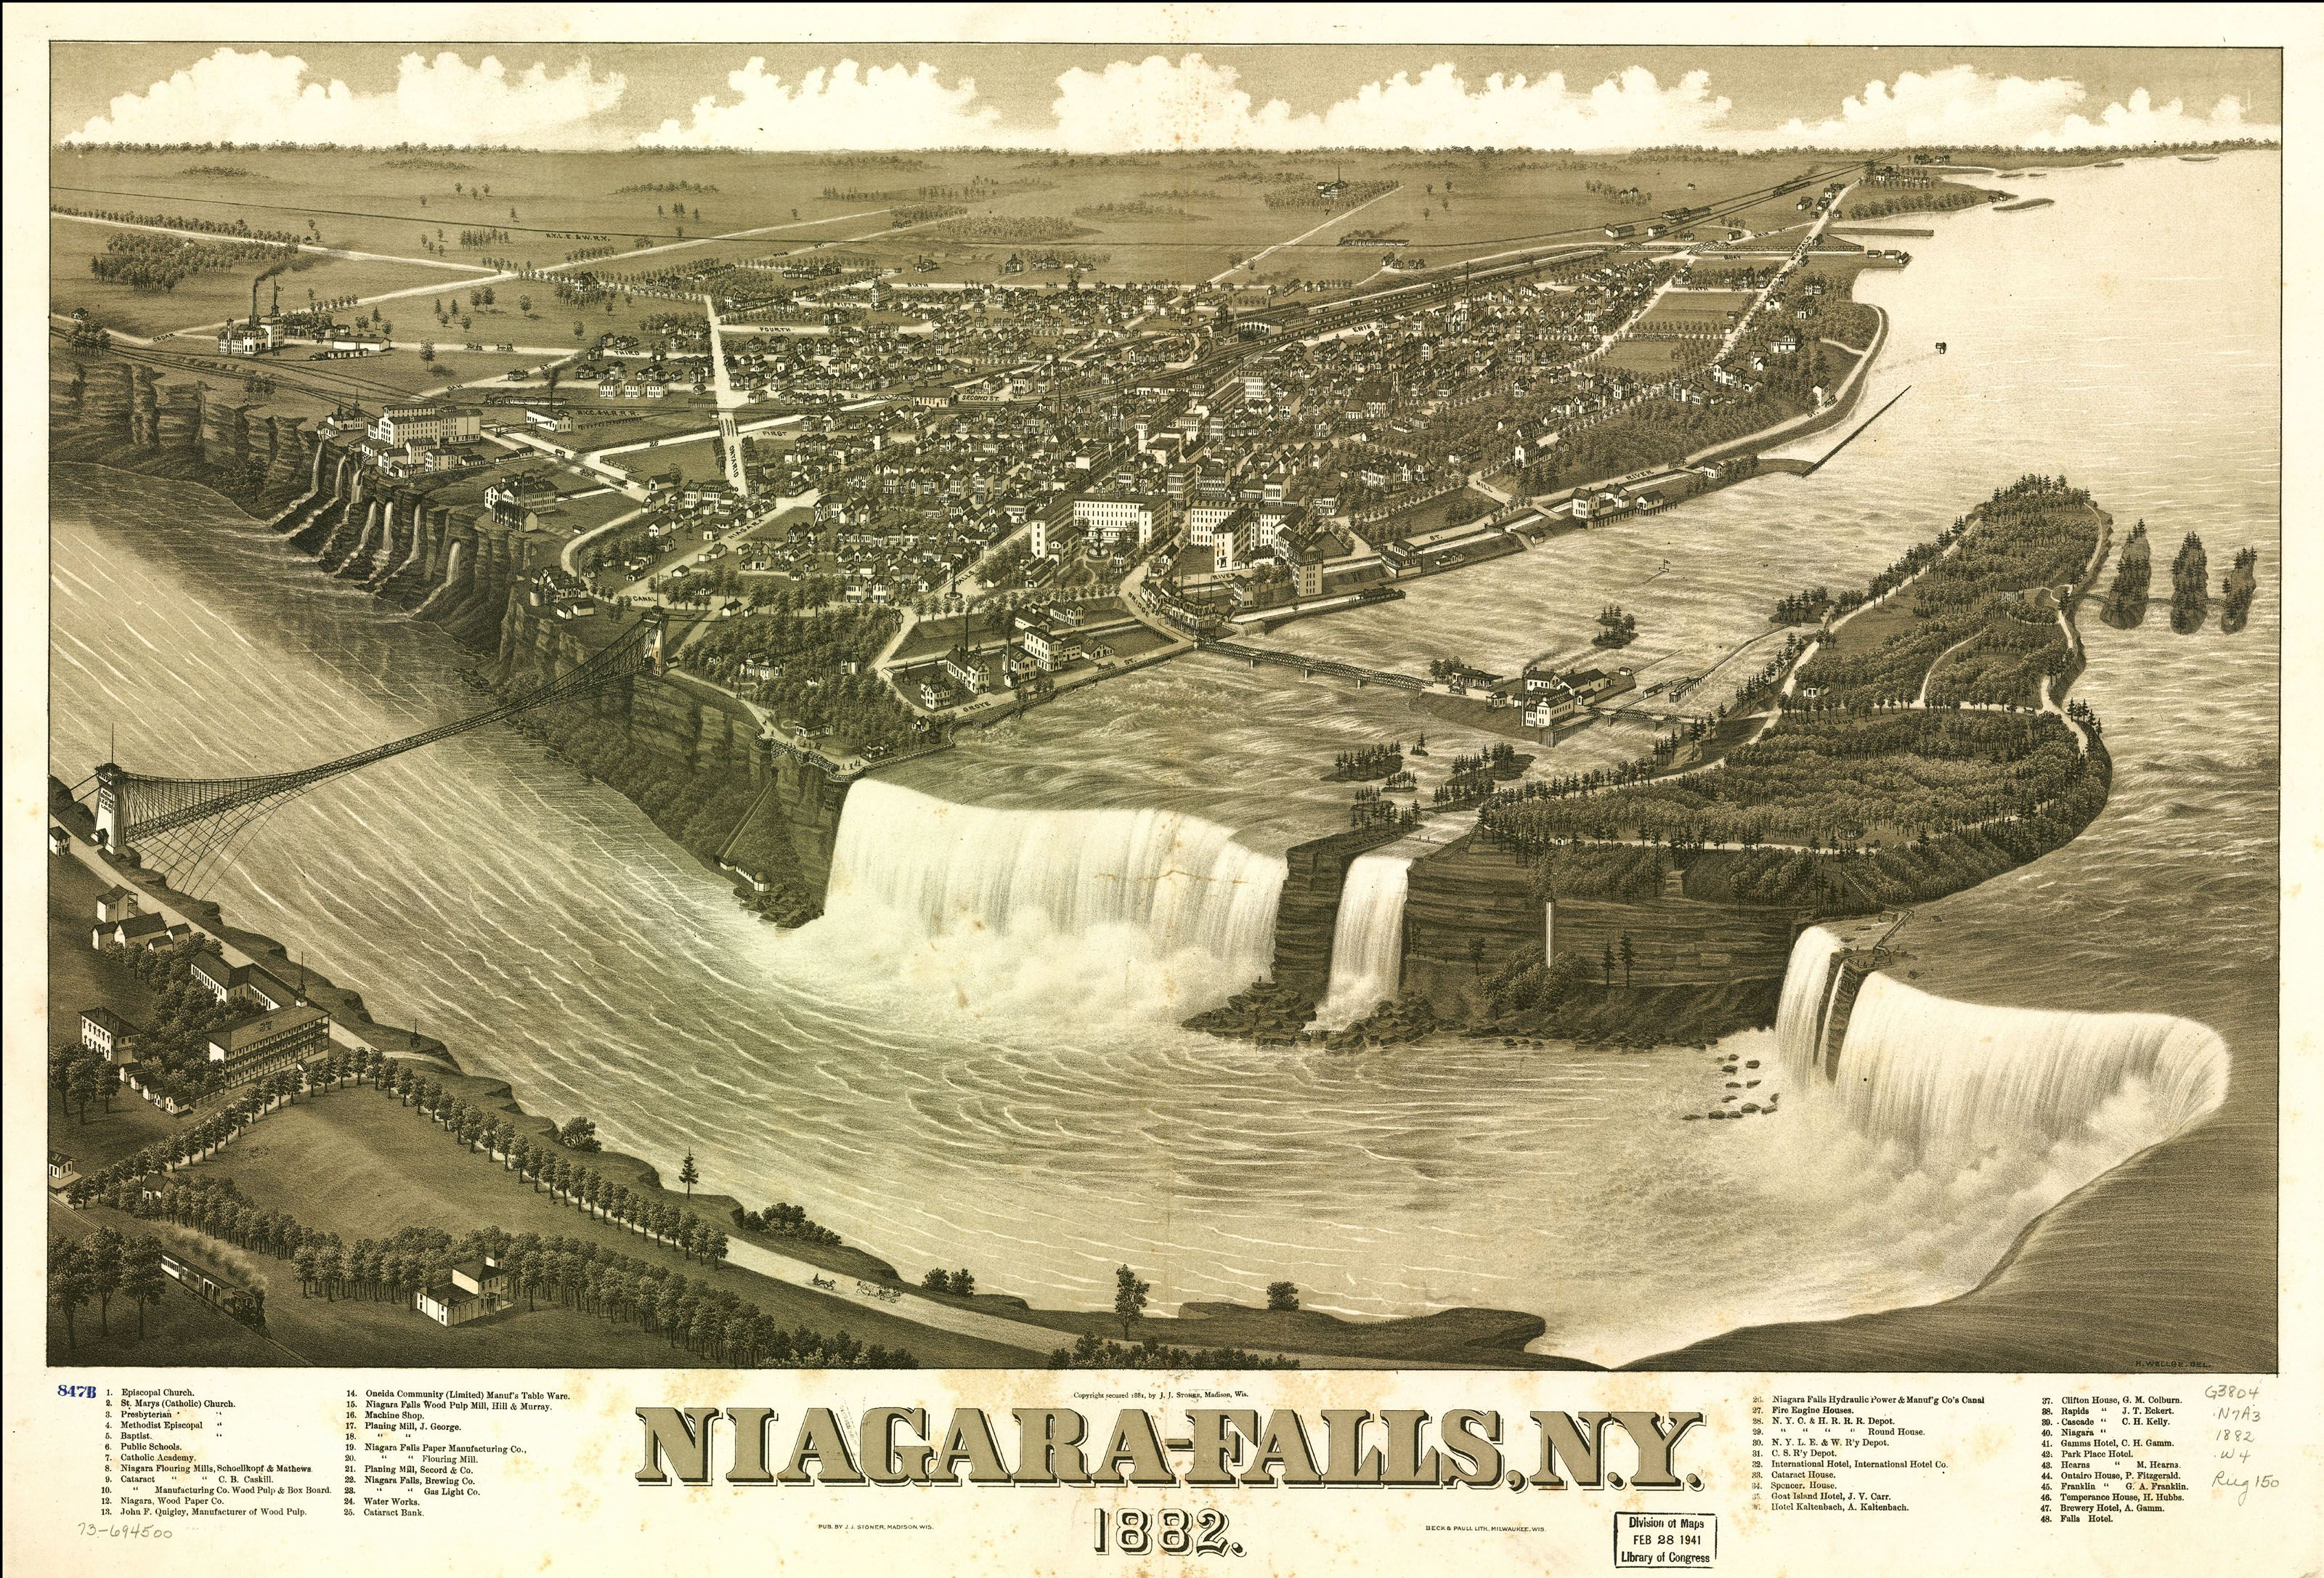 Church Niagara Falls from the American side Wood Framed Canvas Print Repro 11x14